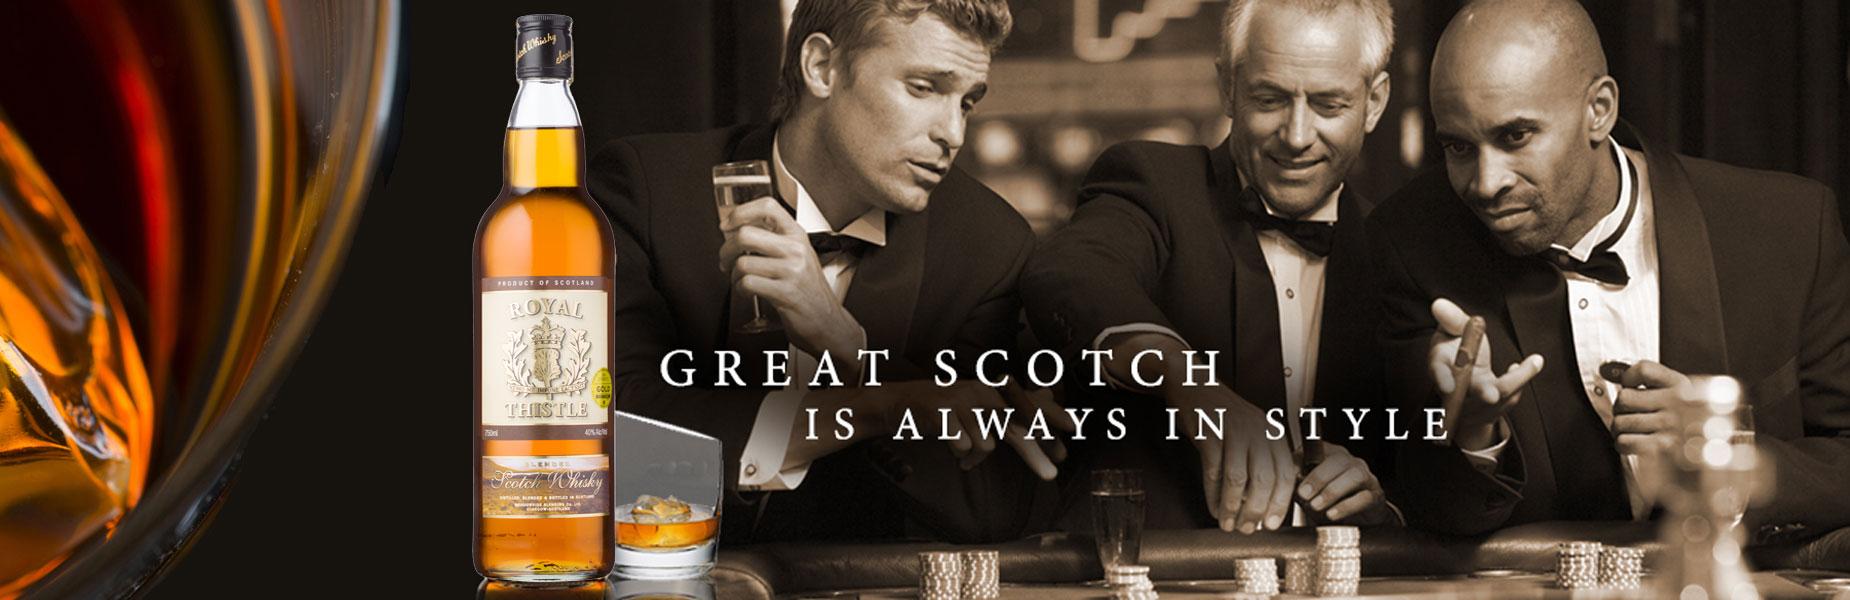 Royal Thistle Whisky